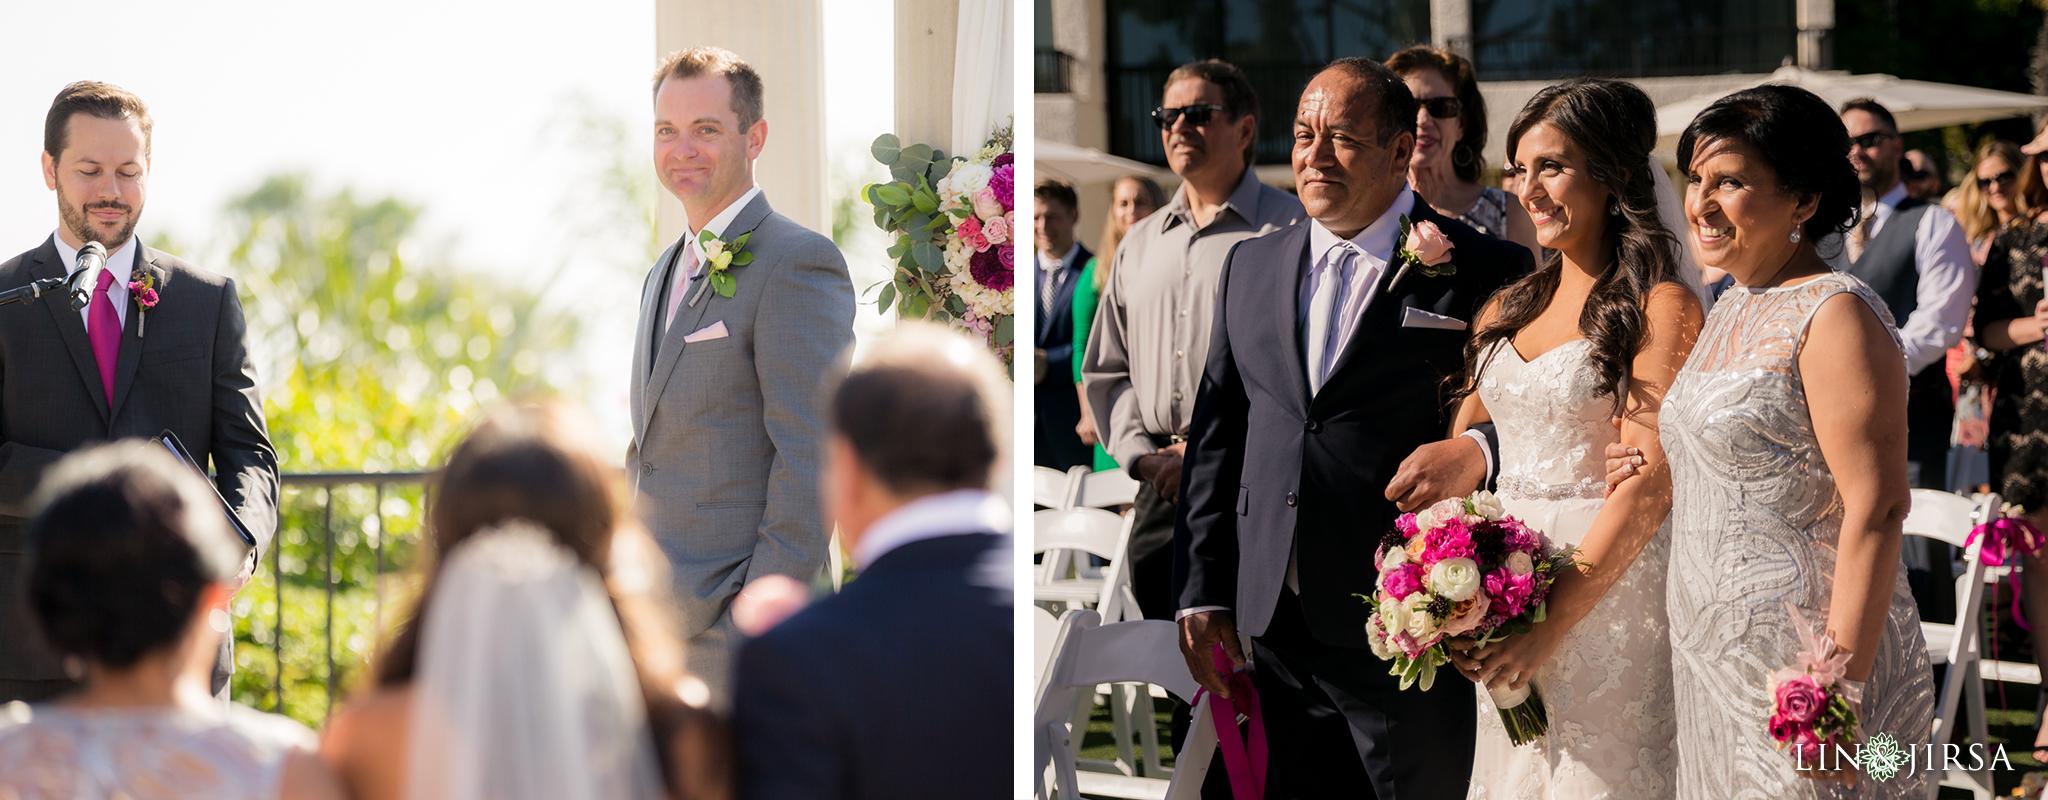 21-newport-beach-marriott-wedding-photography